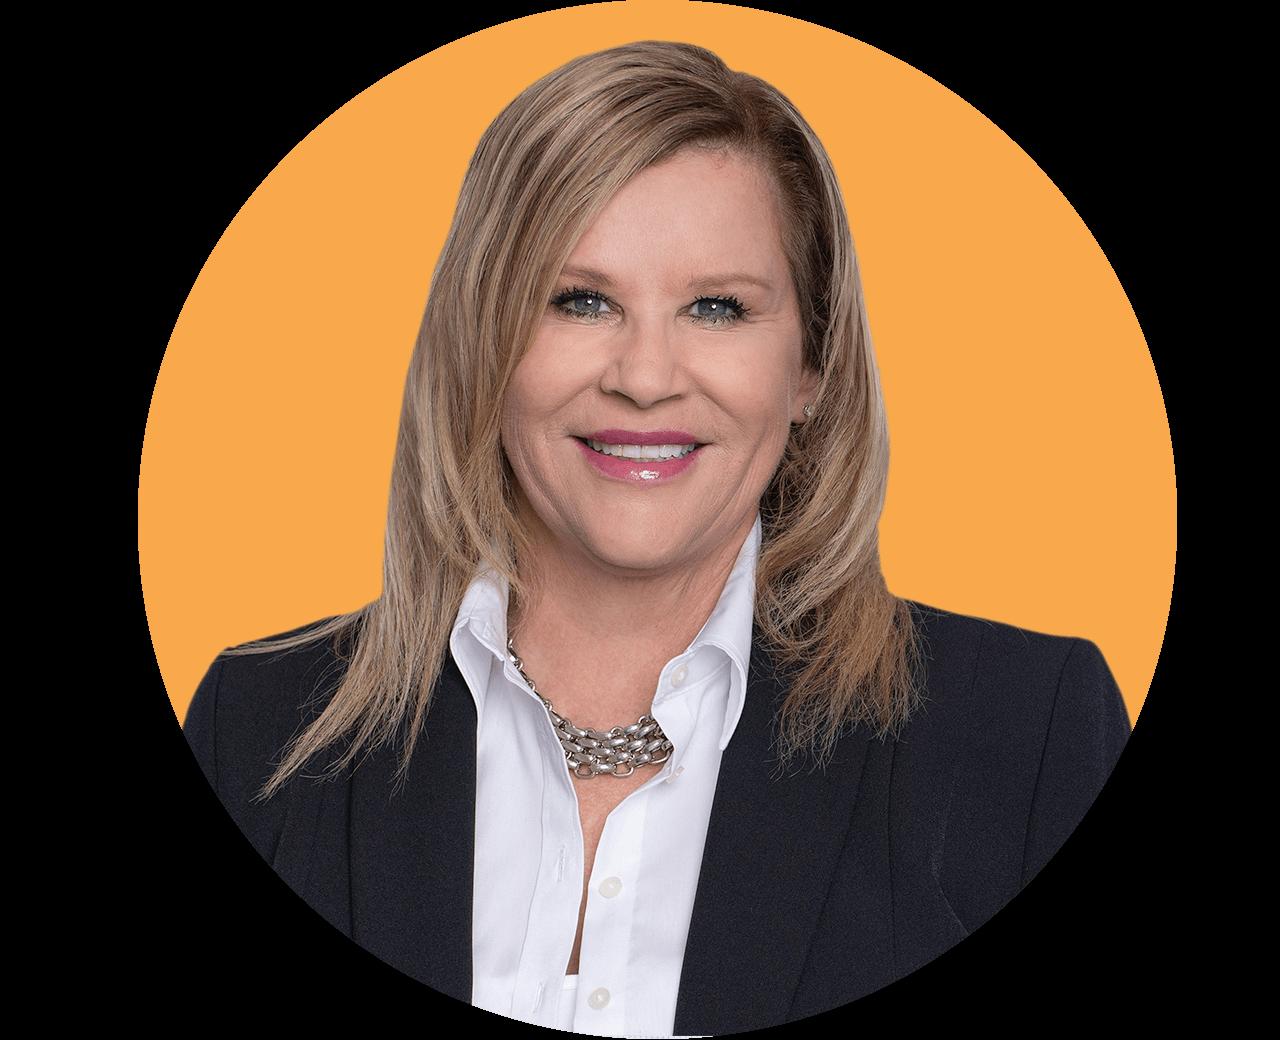 Valerie Rainey - Chief Financial Officer